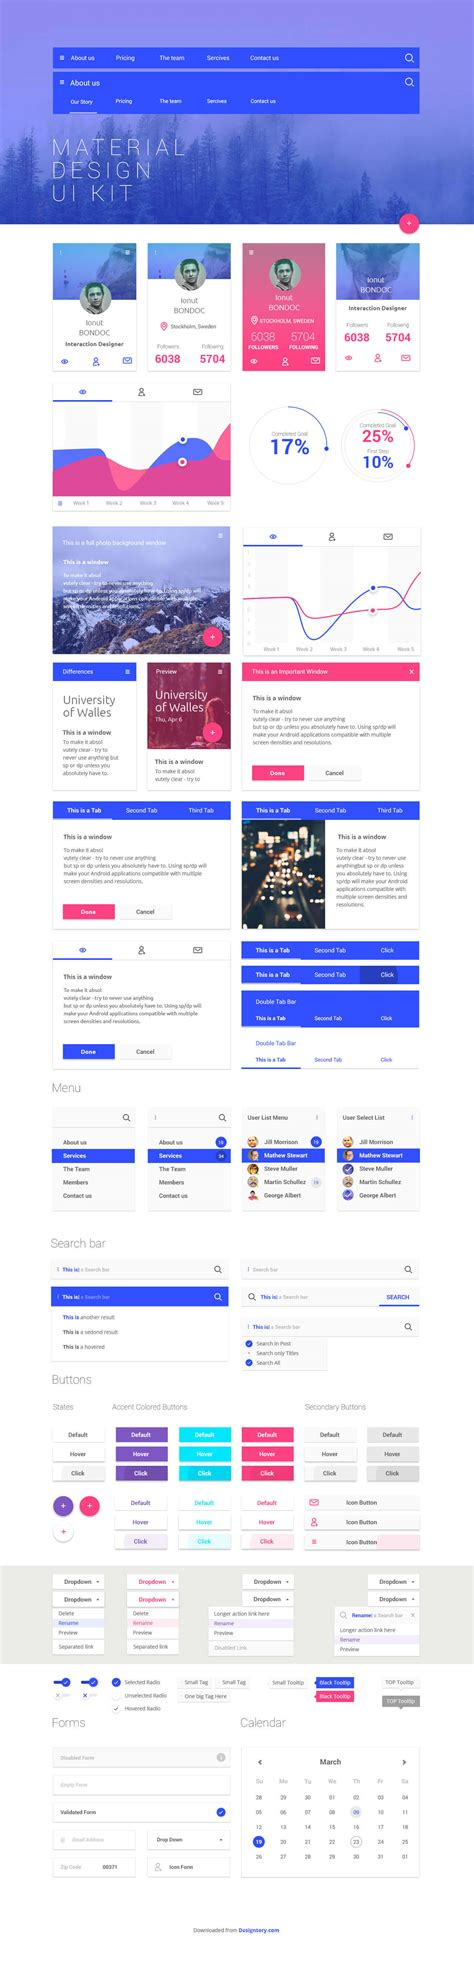 web layout ui kit free material design ui kit for web designers